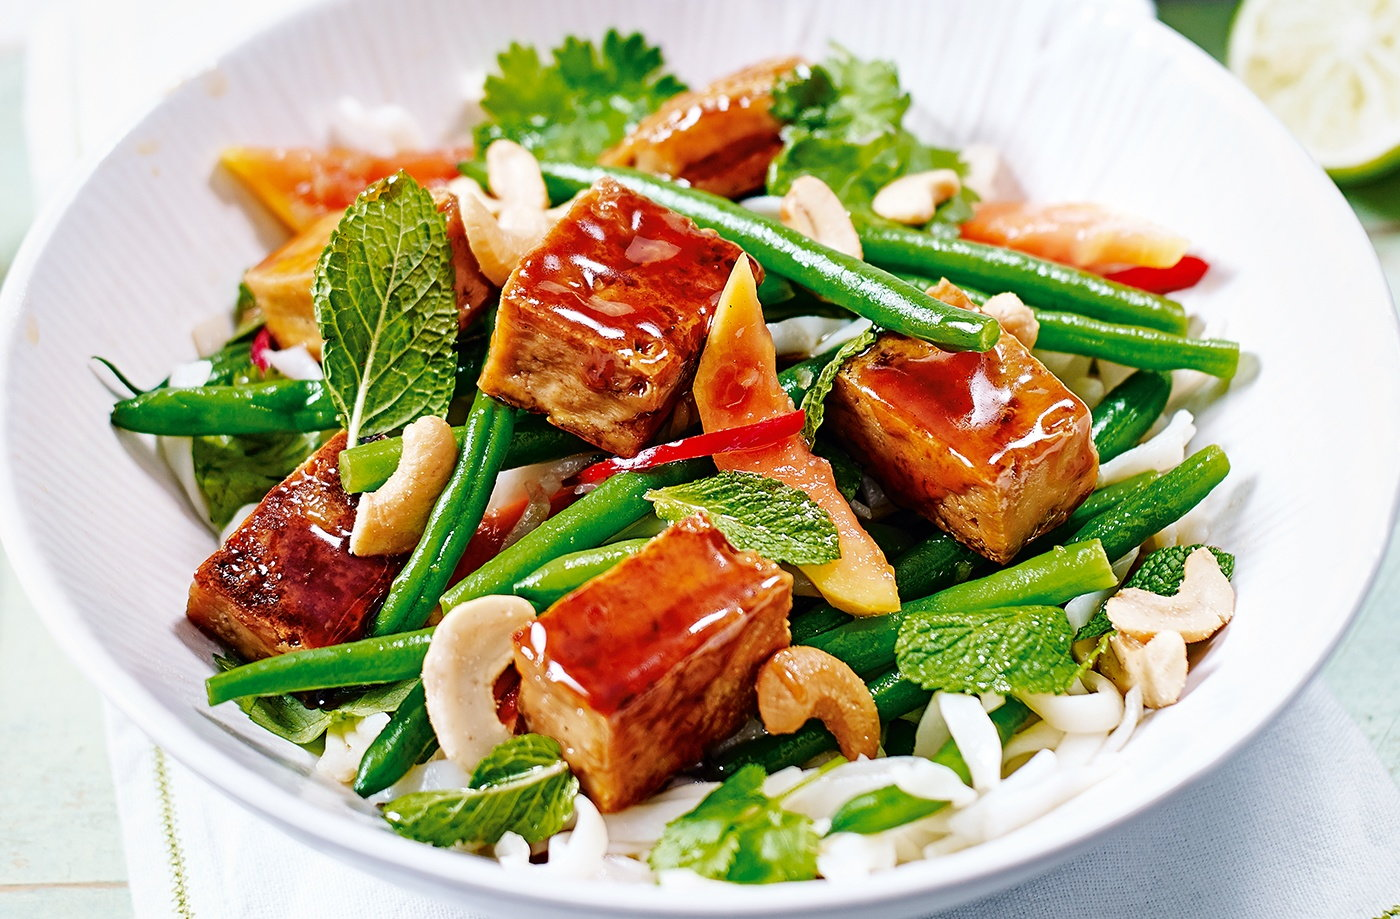 Papaya salad recipe